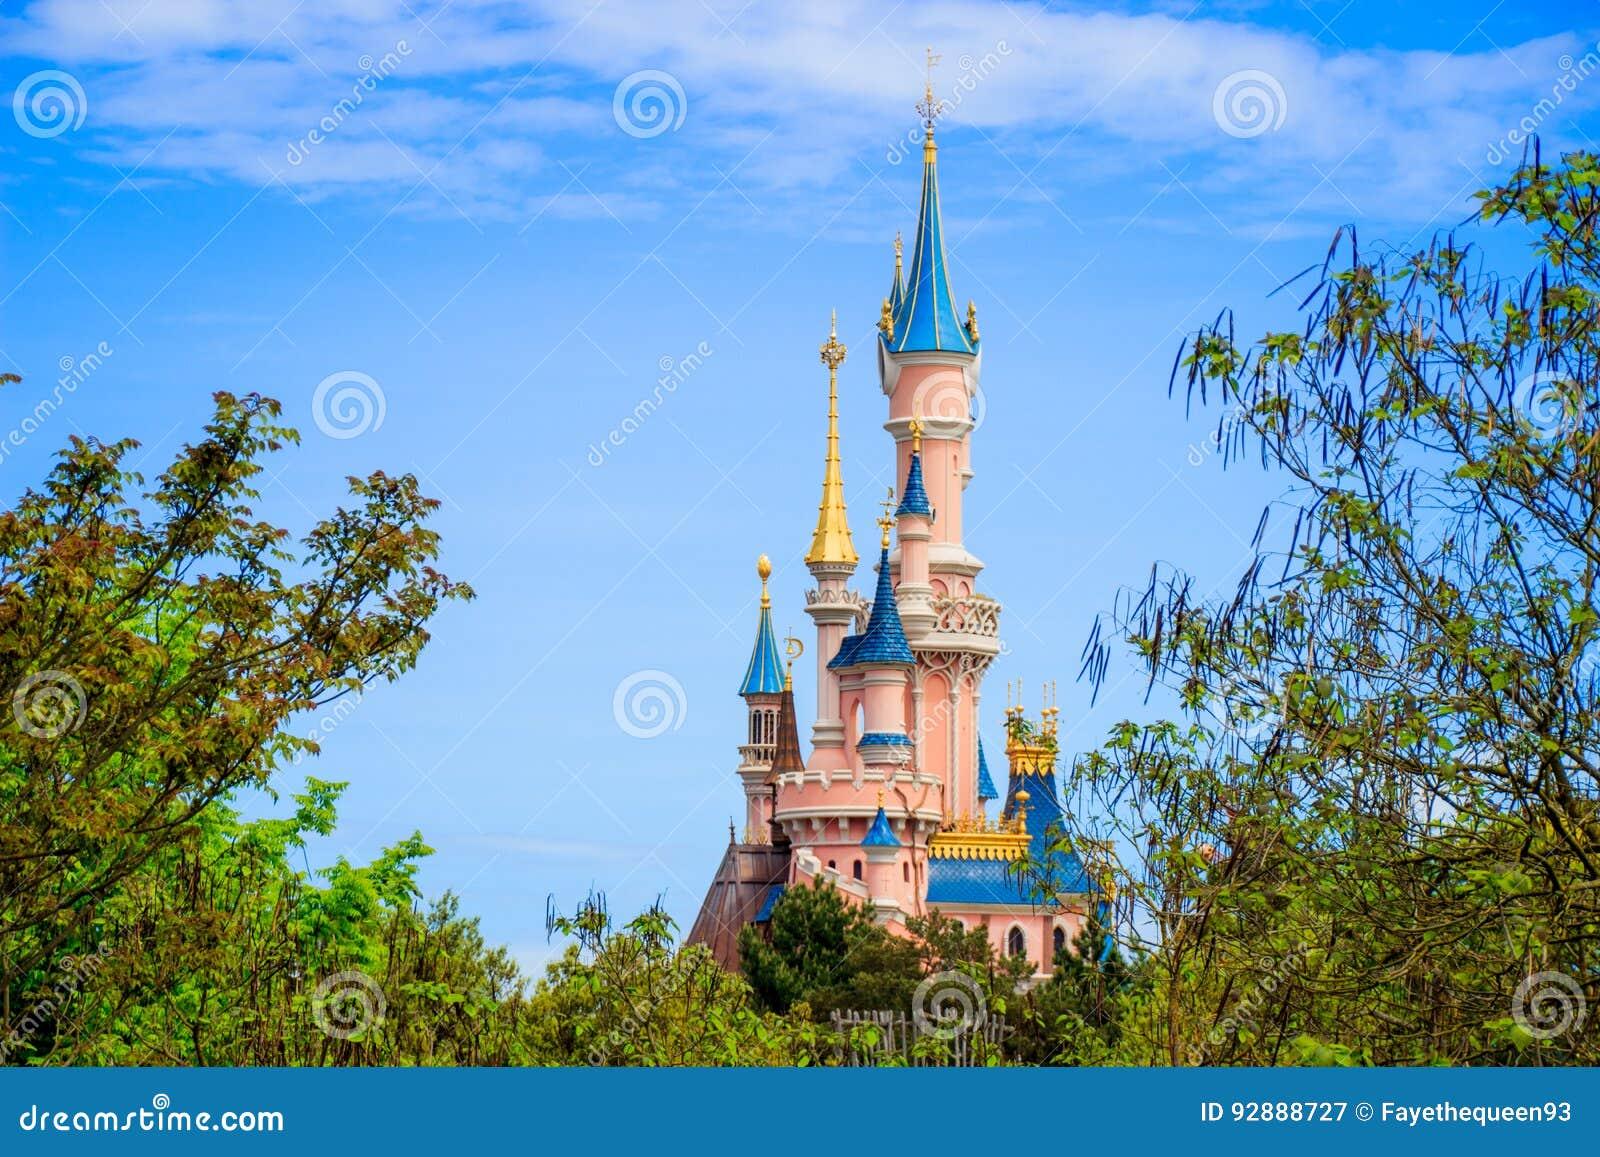 Castello di bella addormentata a Disneyland Parigi, editoriale di Eurodisney